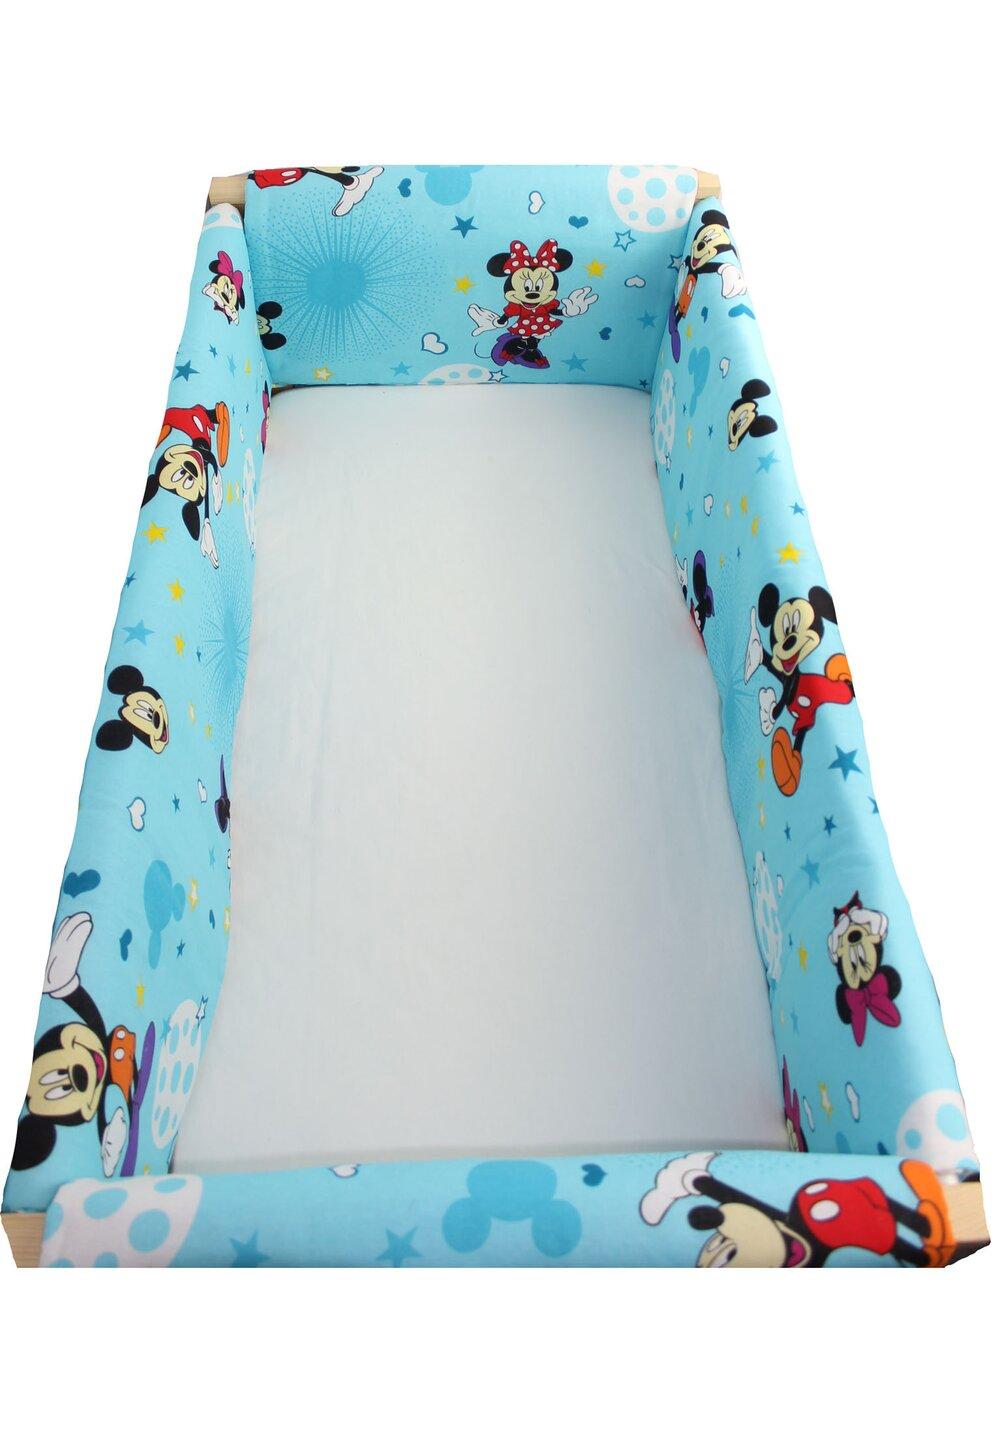 Set aparatori patut, Maxi, Minnie si Mickey, albastru cu stelute, 120x60cm imagine